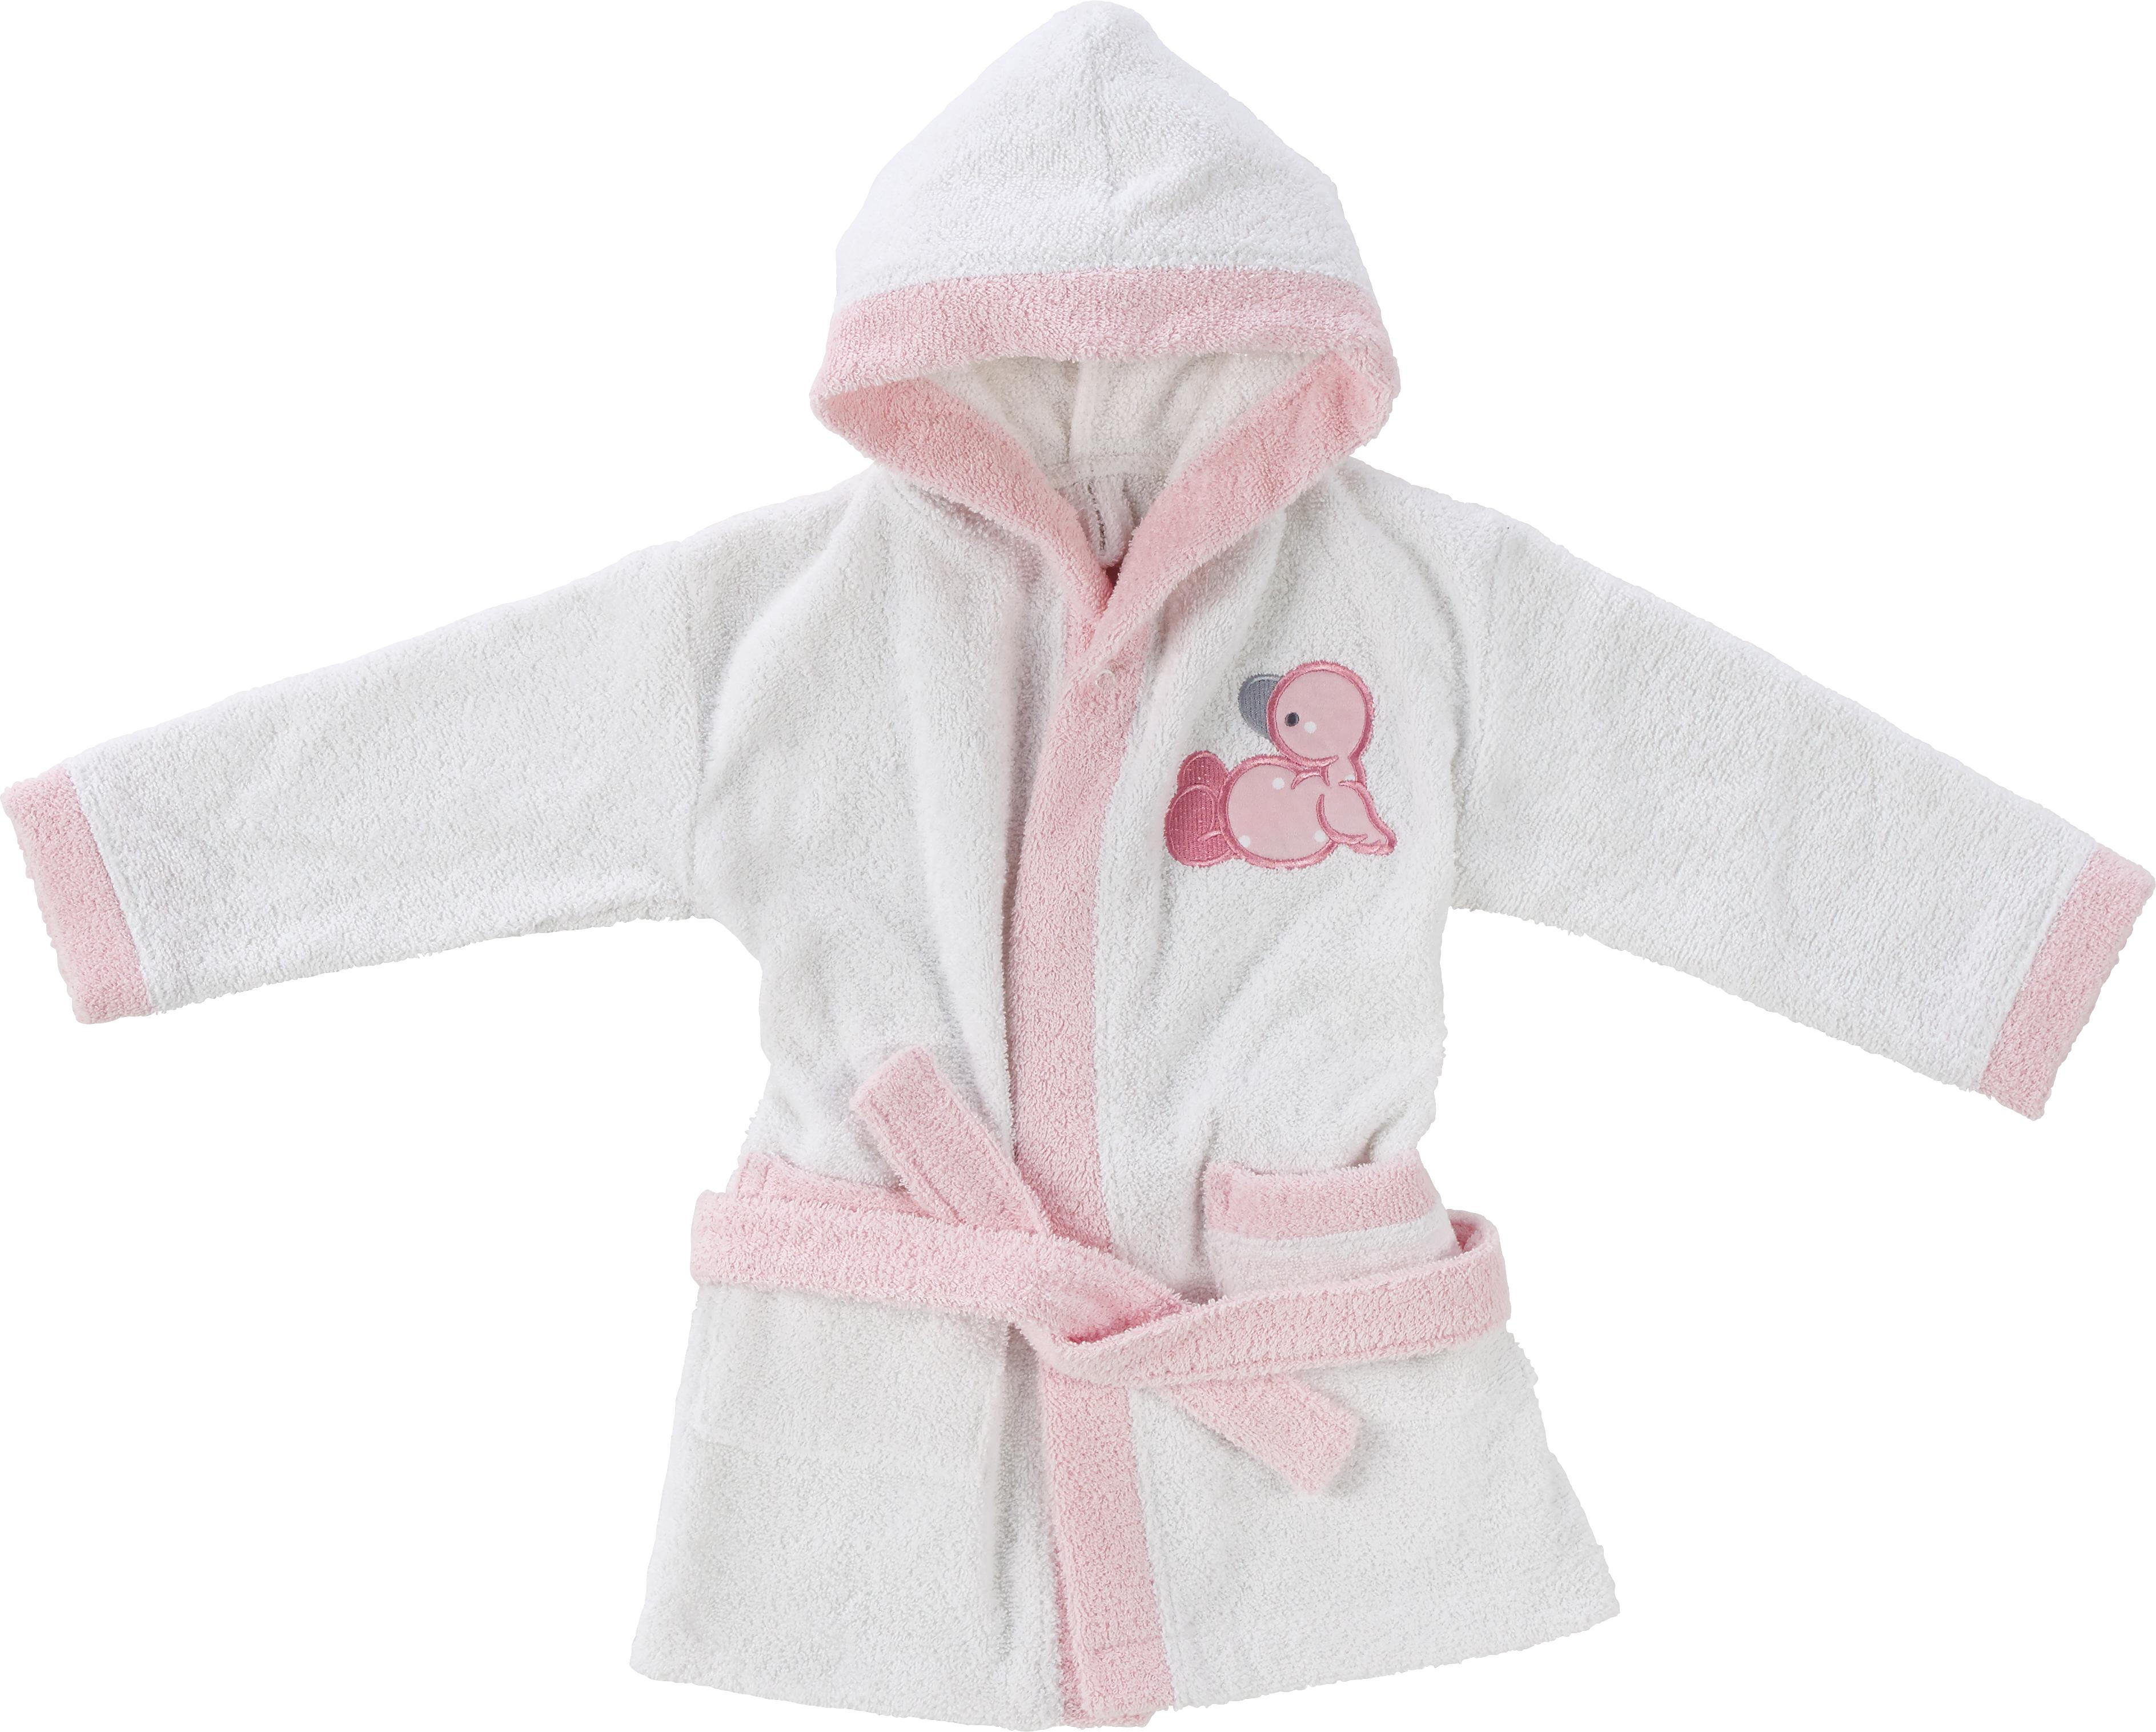 BADROCK FÖR BARN - vit/rosa, Basics, textil (74/80) - My Baby Lou